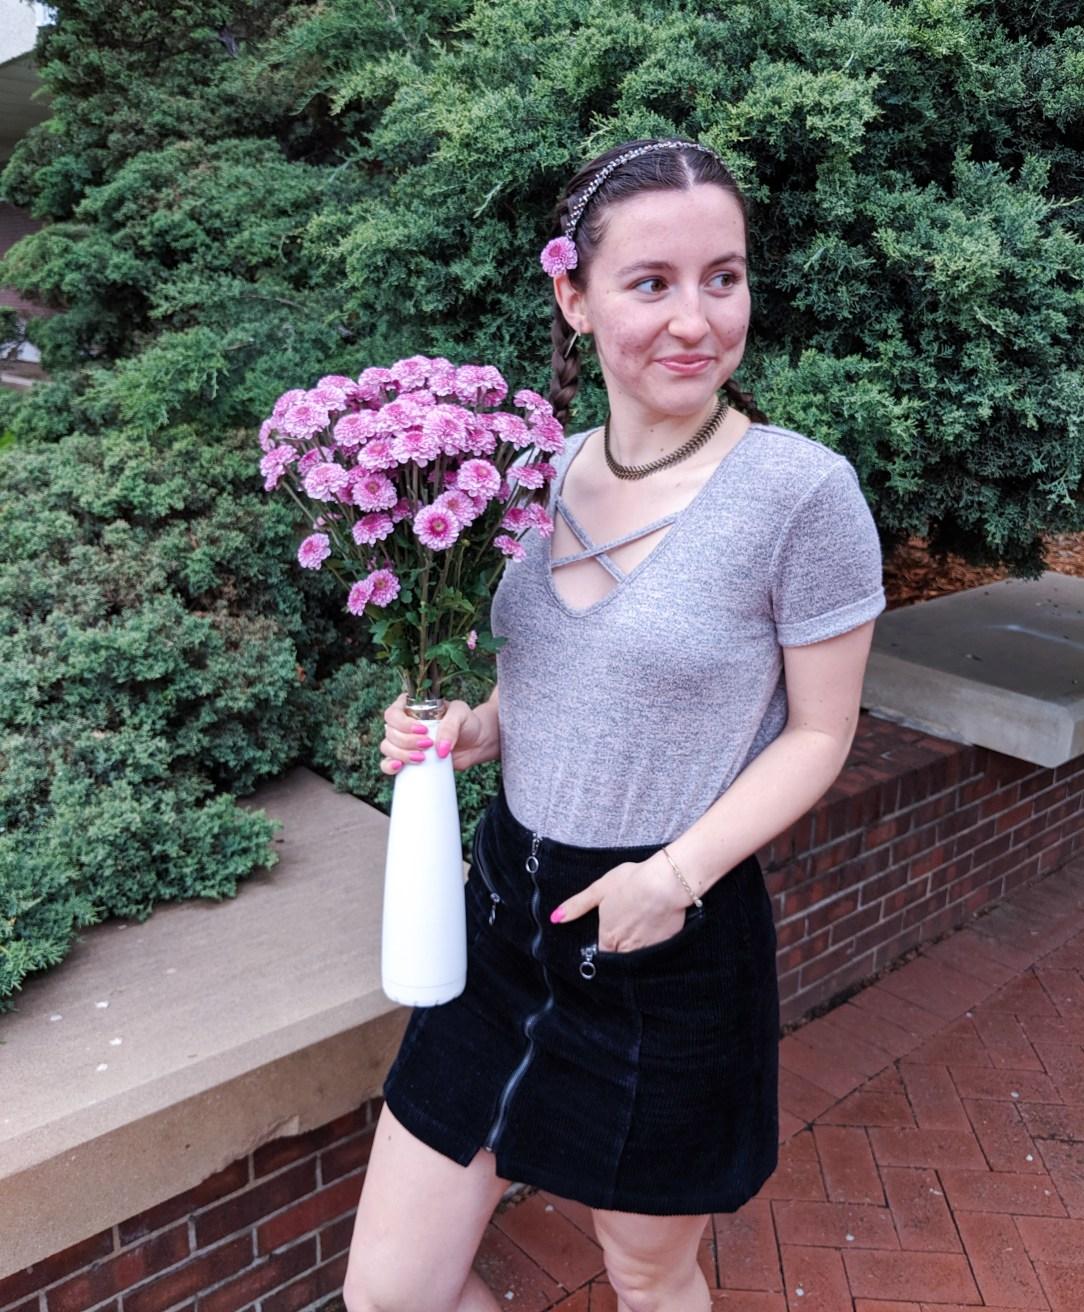 blush t-shirt, black corduroy skirt, pink flowers